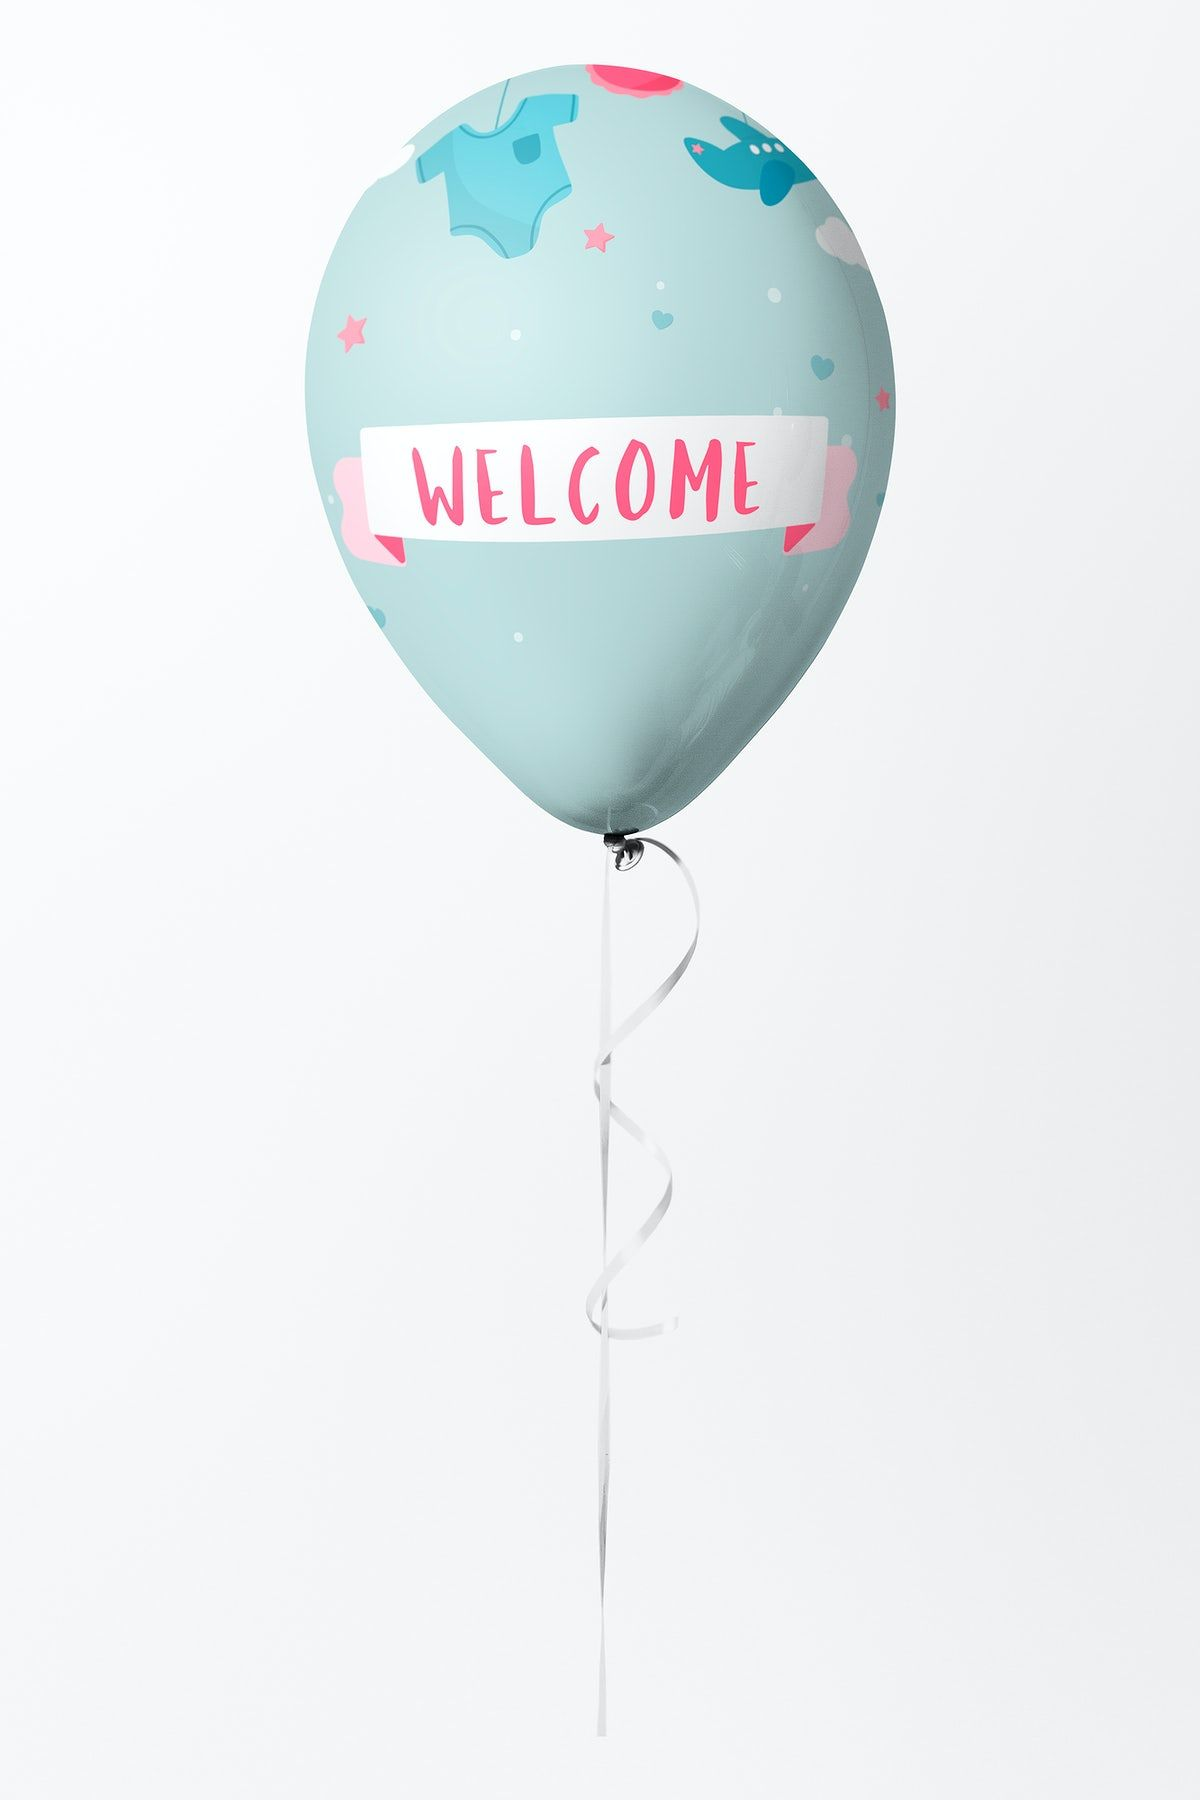 Download Premium Illustration Of Cute Pastel Blue Welcome Balloon Mockup Balloons Pink Wallpaper Iphone Design Mockup Free